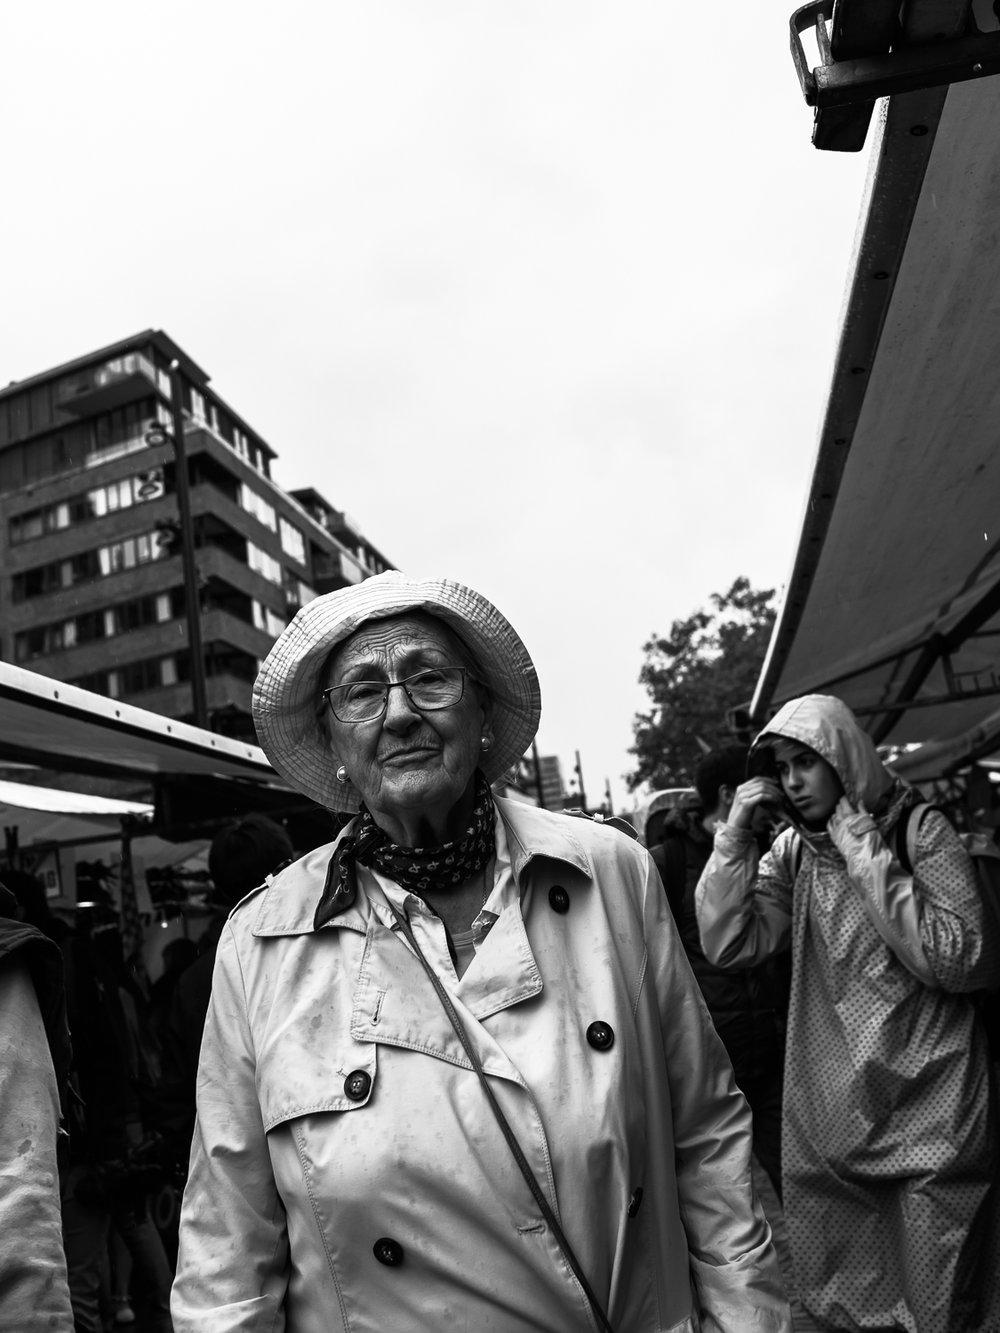 fokko muller street photography - 180922 - 008.jpg